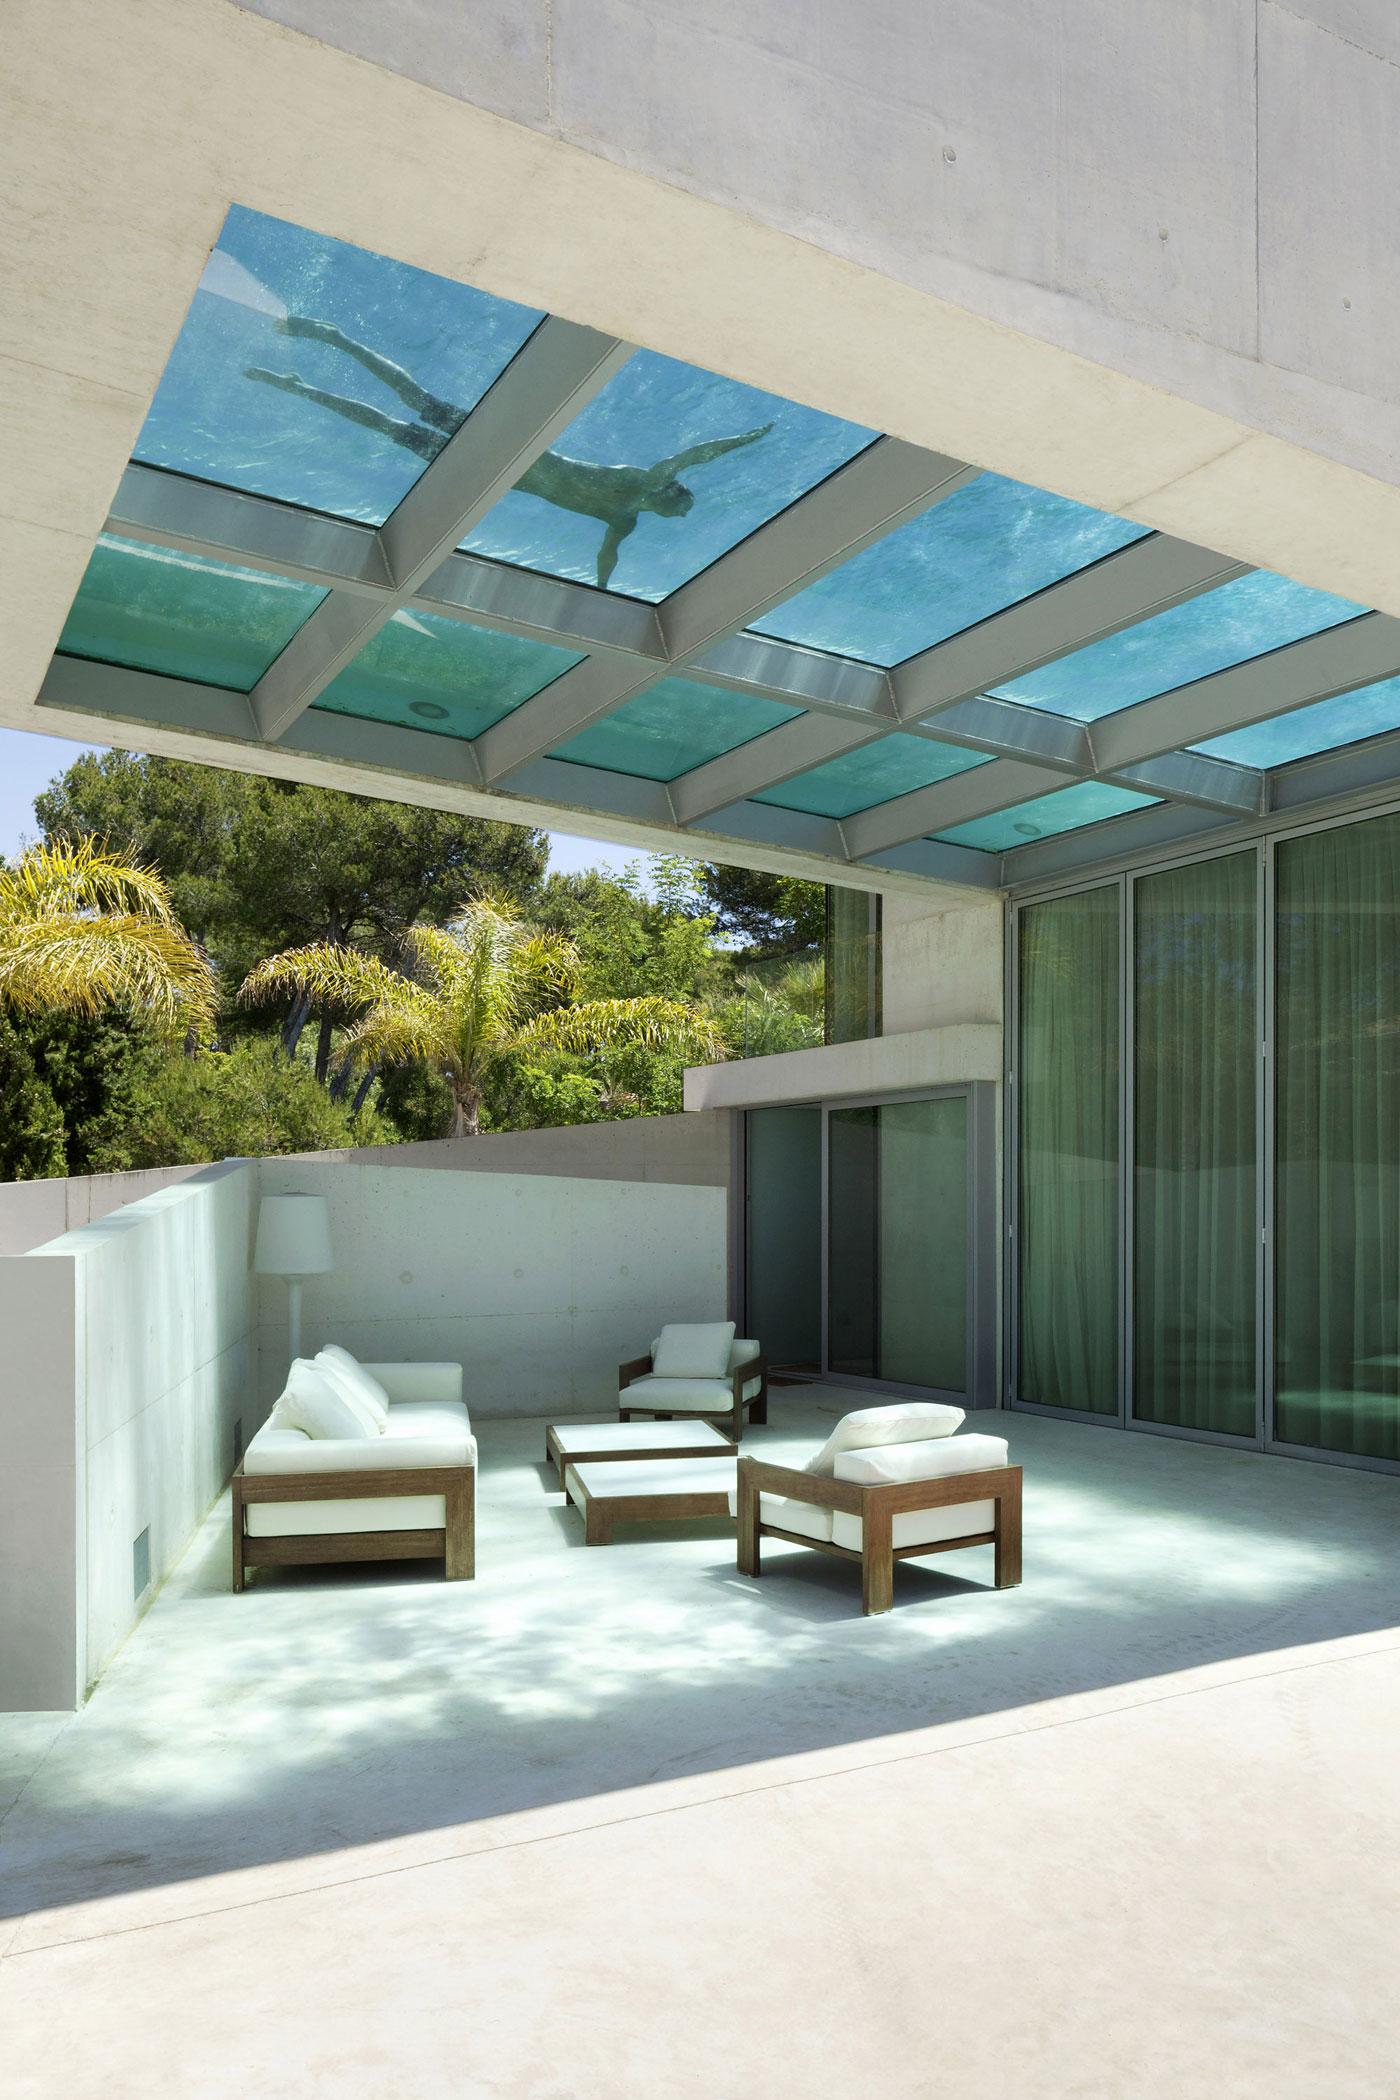 Jellyfish House, espectacular residencia con terraza en la azotea y piscina infinita 13